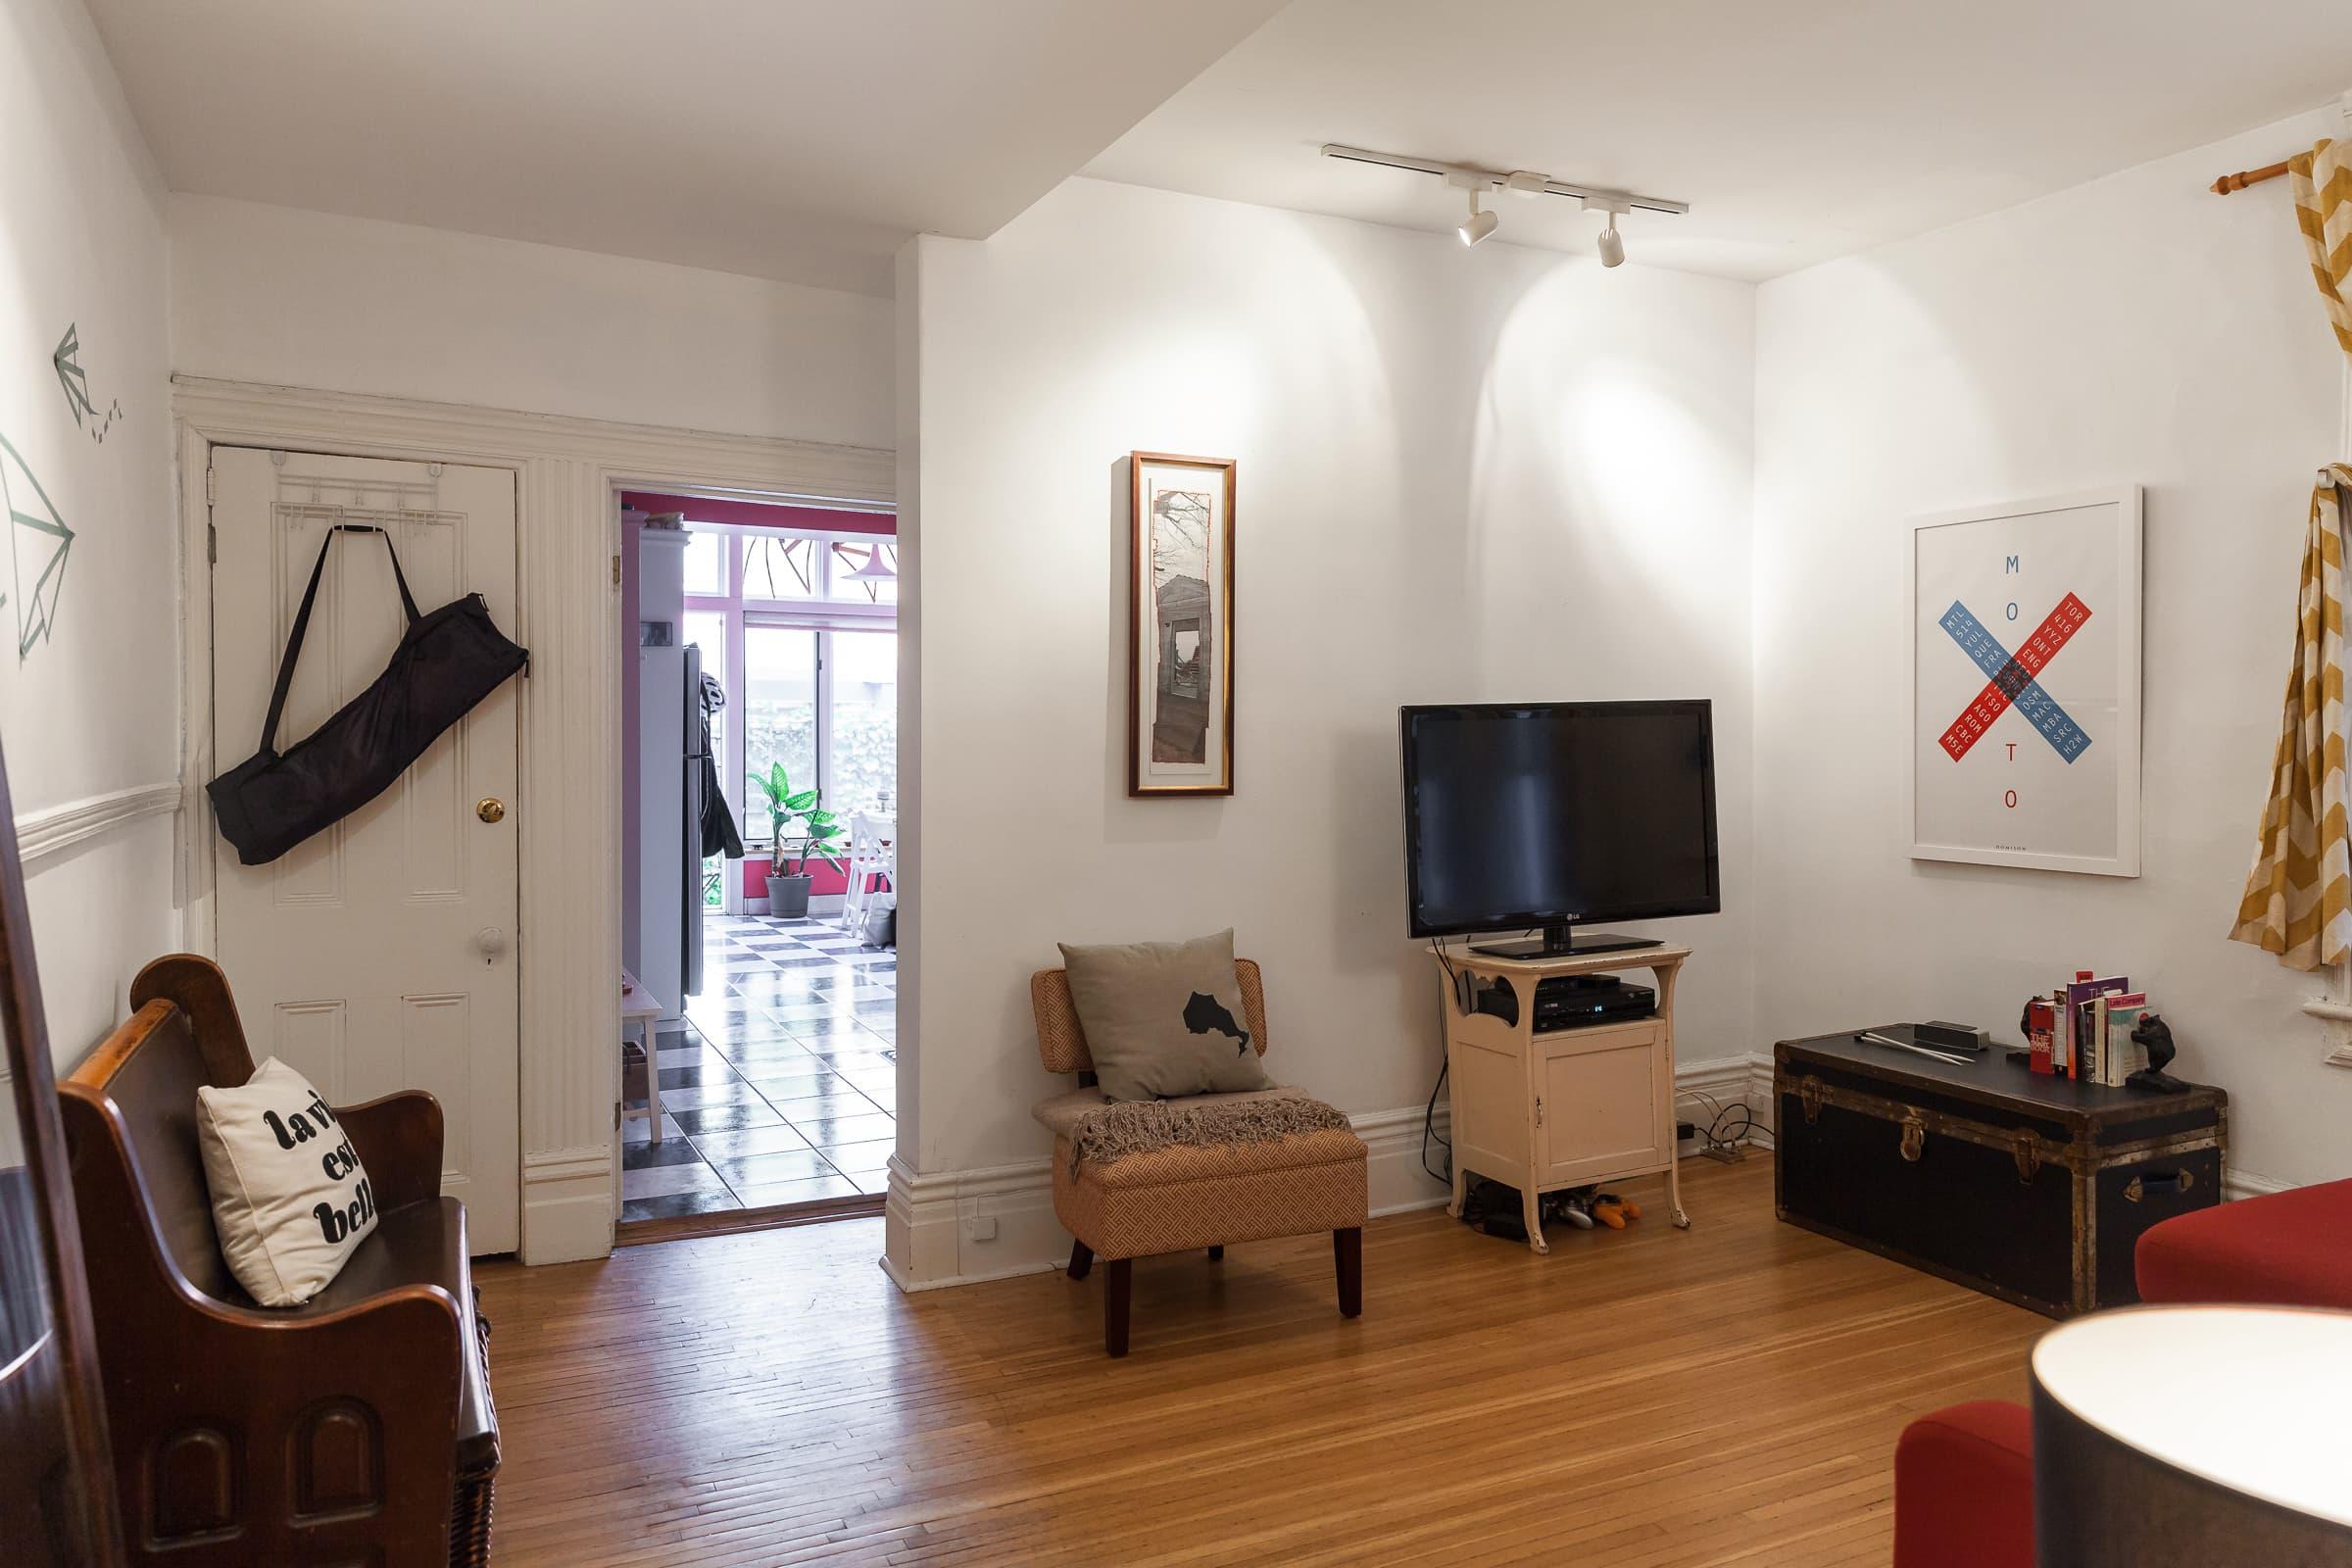 House Tour: A Small Toronto Apartment and Lush Patio ...